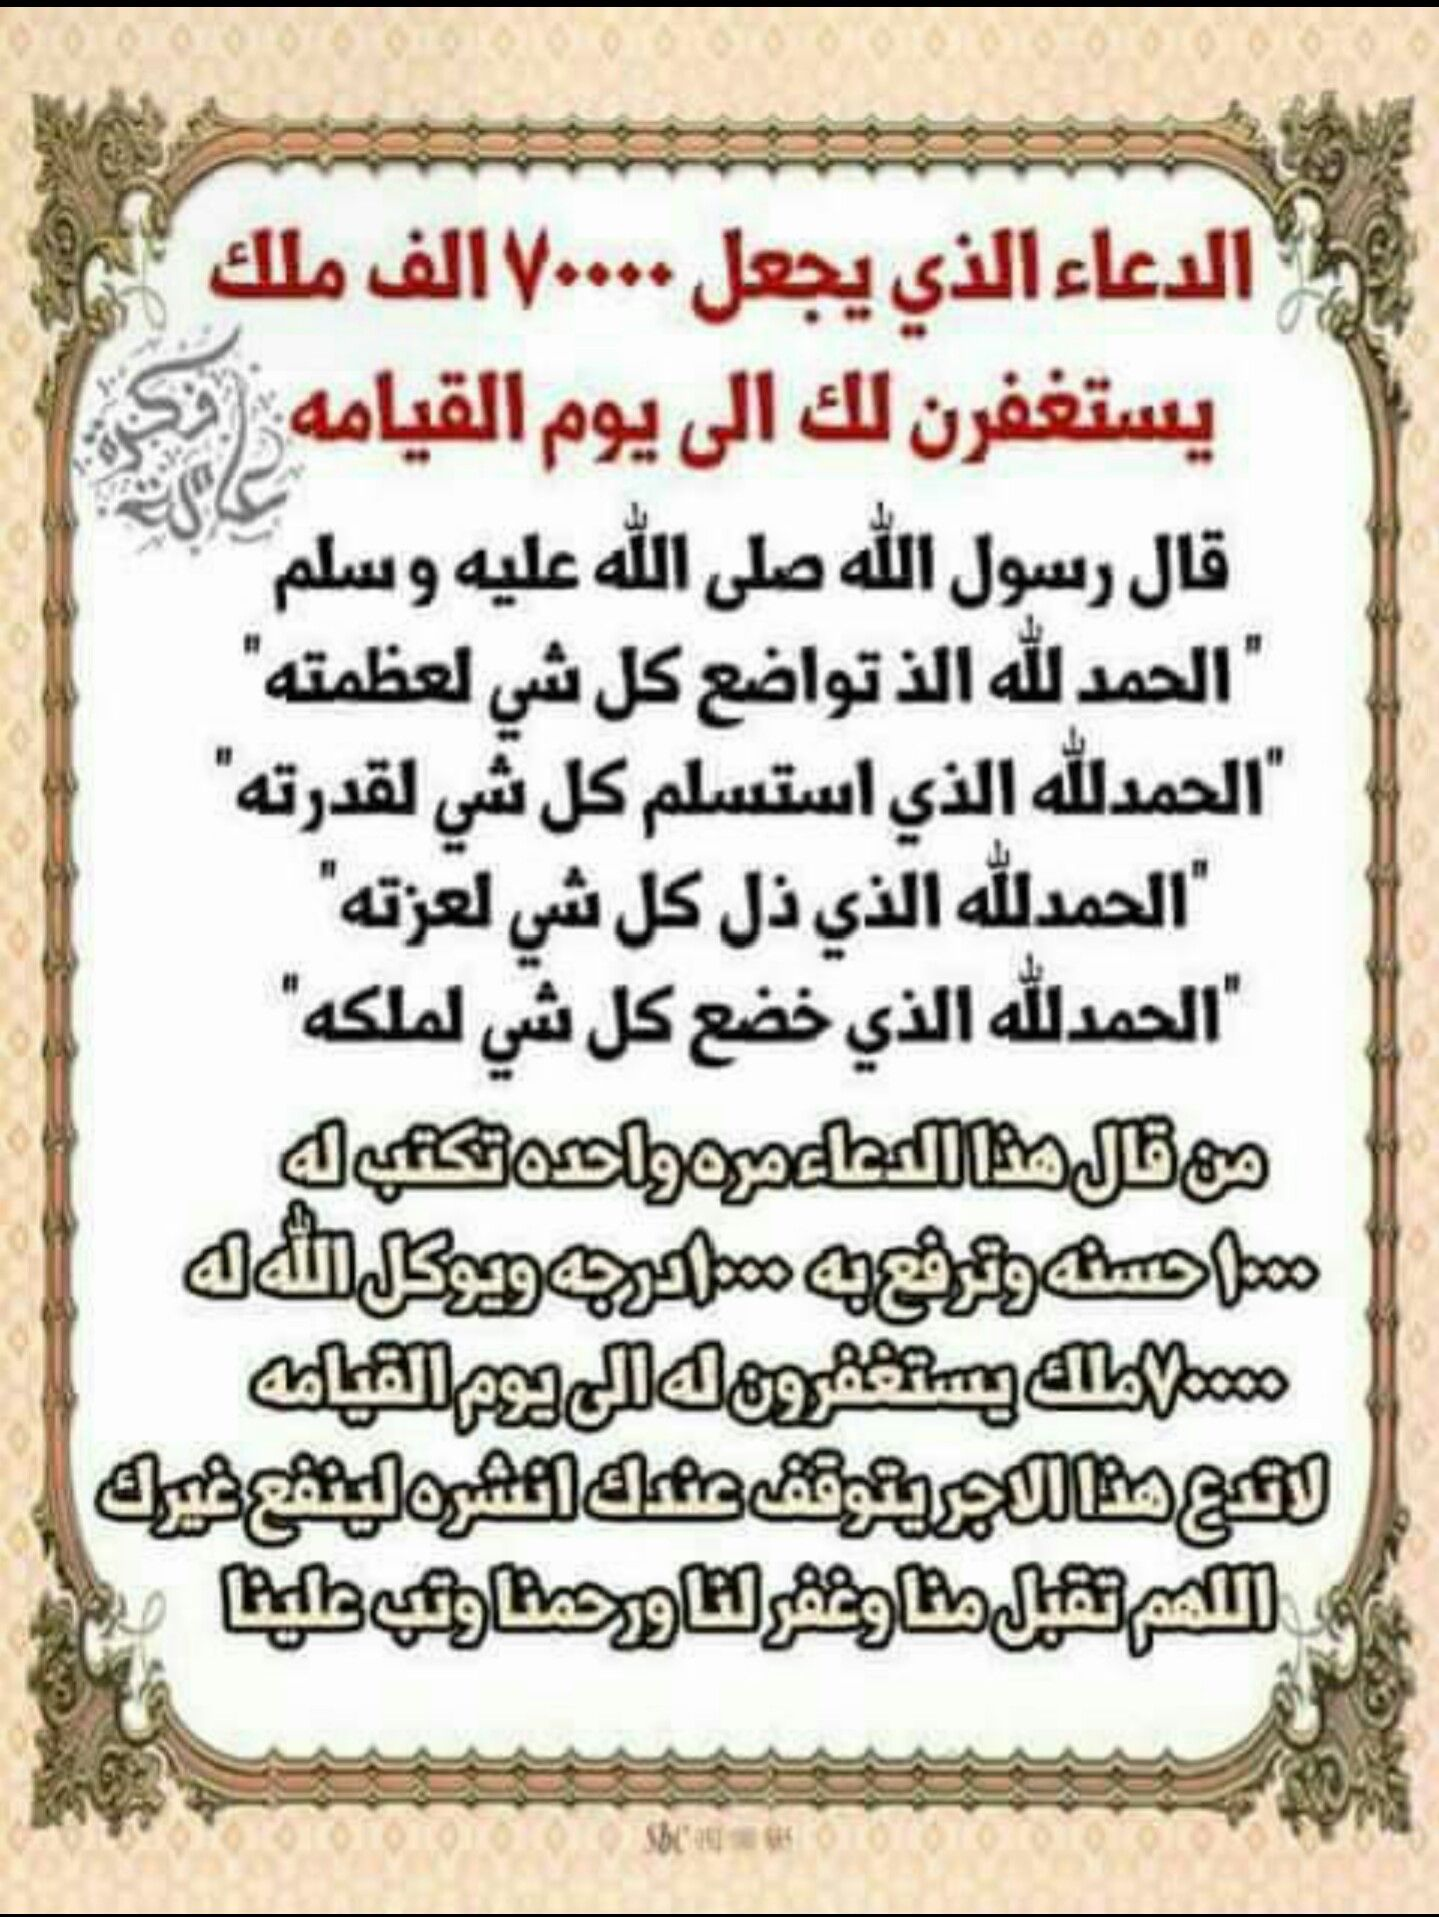 Pin By G S On مختارات دينيه Islamic Phrases Islam Facts Quran Recitation